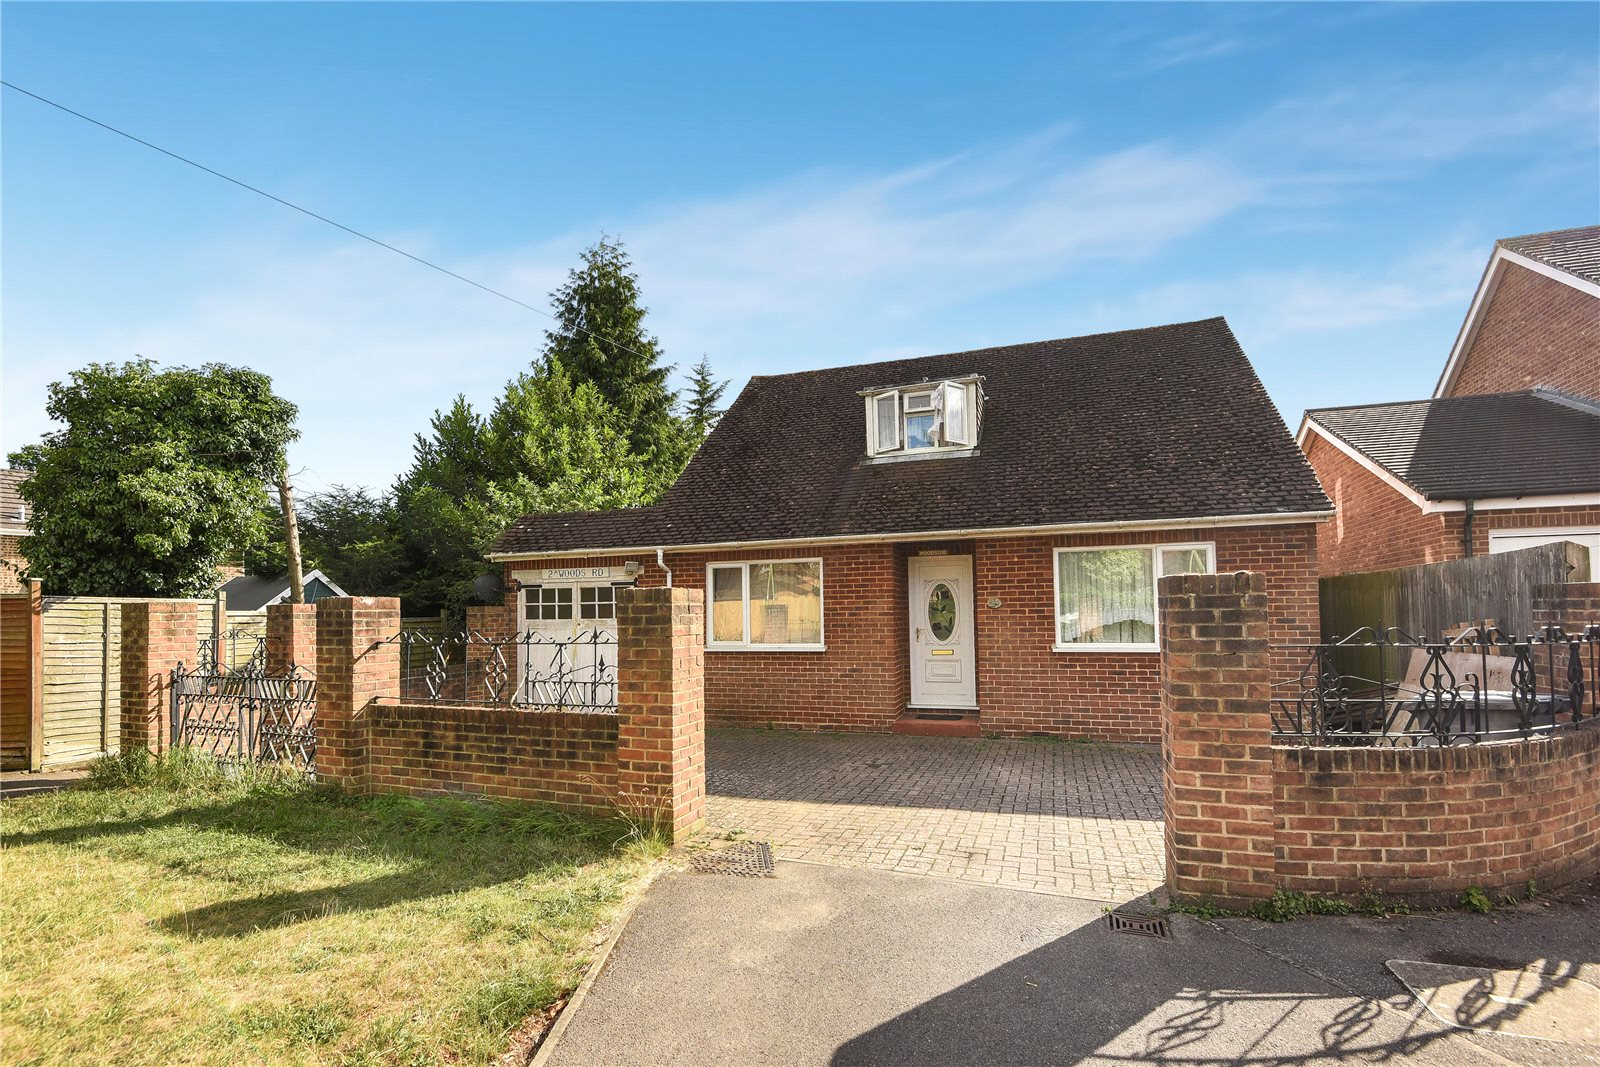 3 Bedrooms Detached Bungalow for sale in Woods Road, Caversham, Reading, Berkshire, RG4